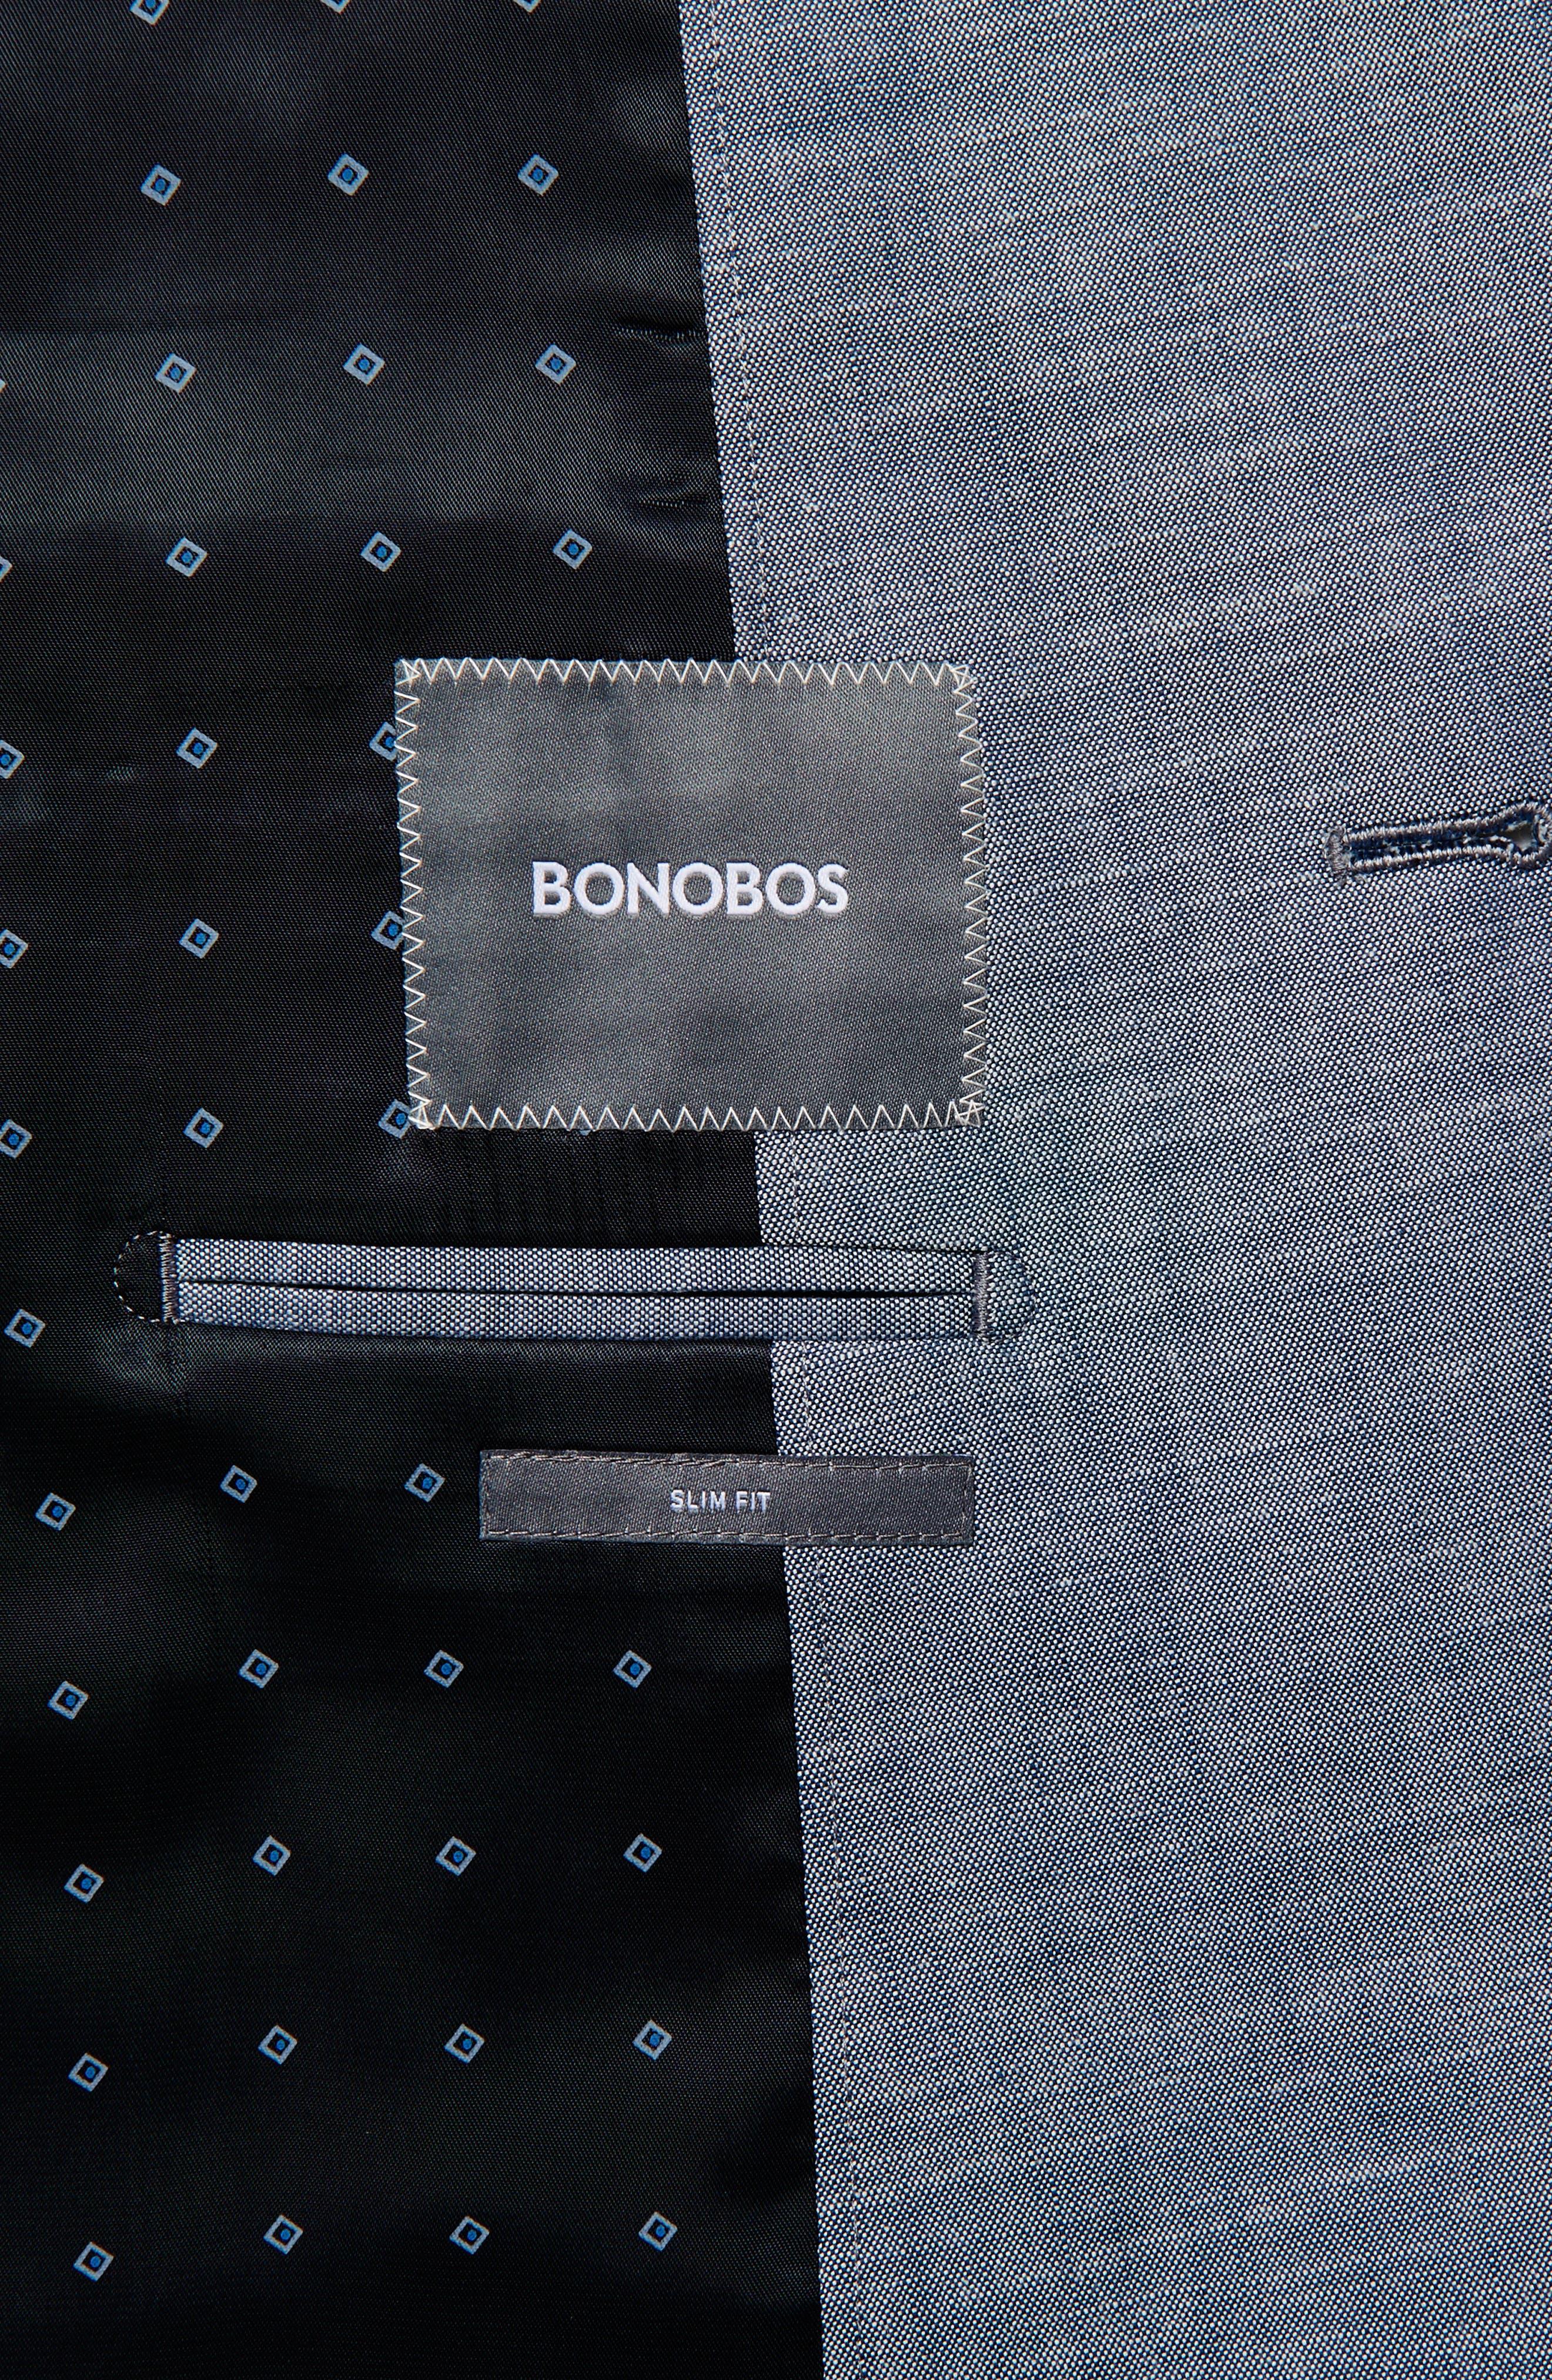 BONOBOS, Slim Fit Chambray Cotton Blazer, Alternate thumbnail 4, color, SOLID BLUE